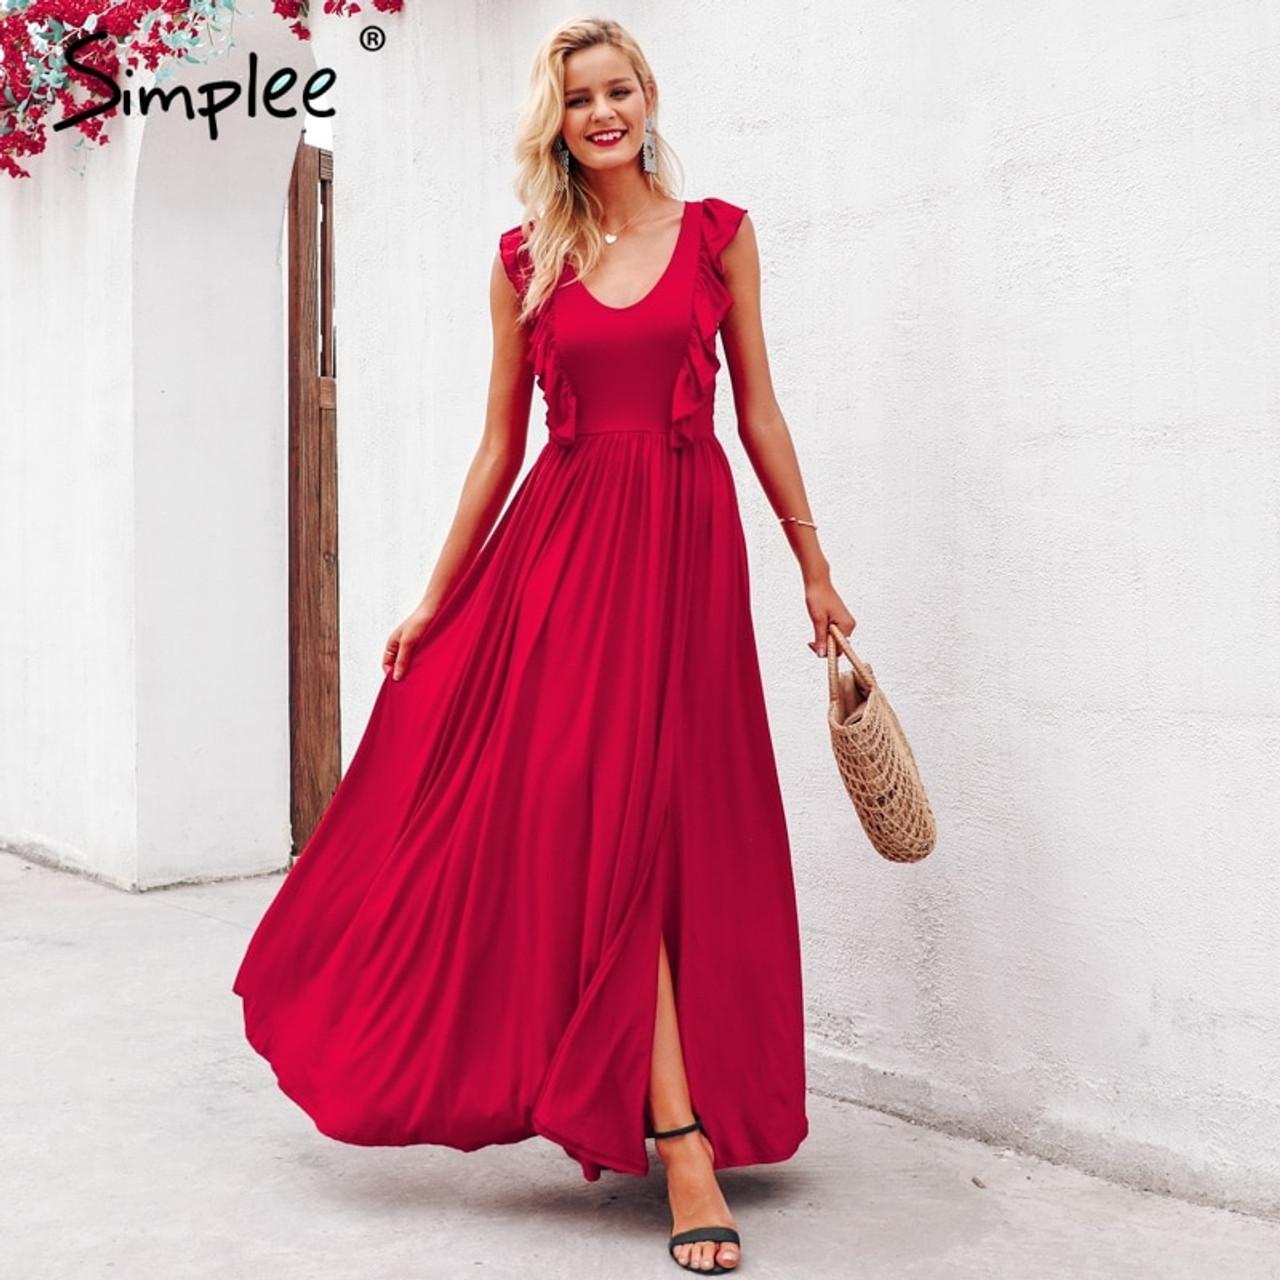 bdcae225b2 ... Simplee Sexy pleated red long women dress Ruffles O neck split maxi  summer dress 2019 Elegant ...